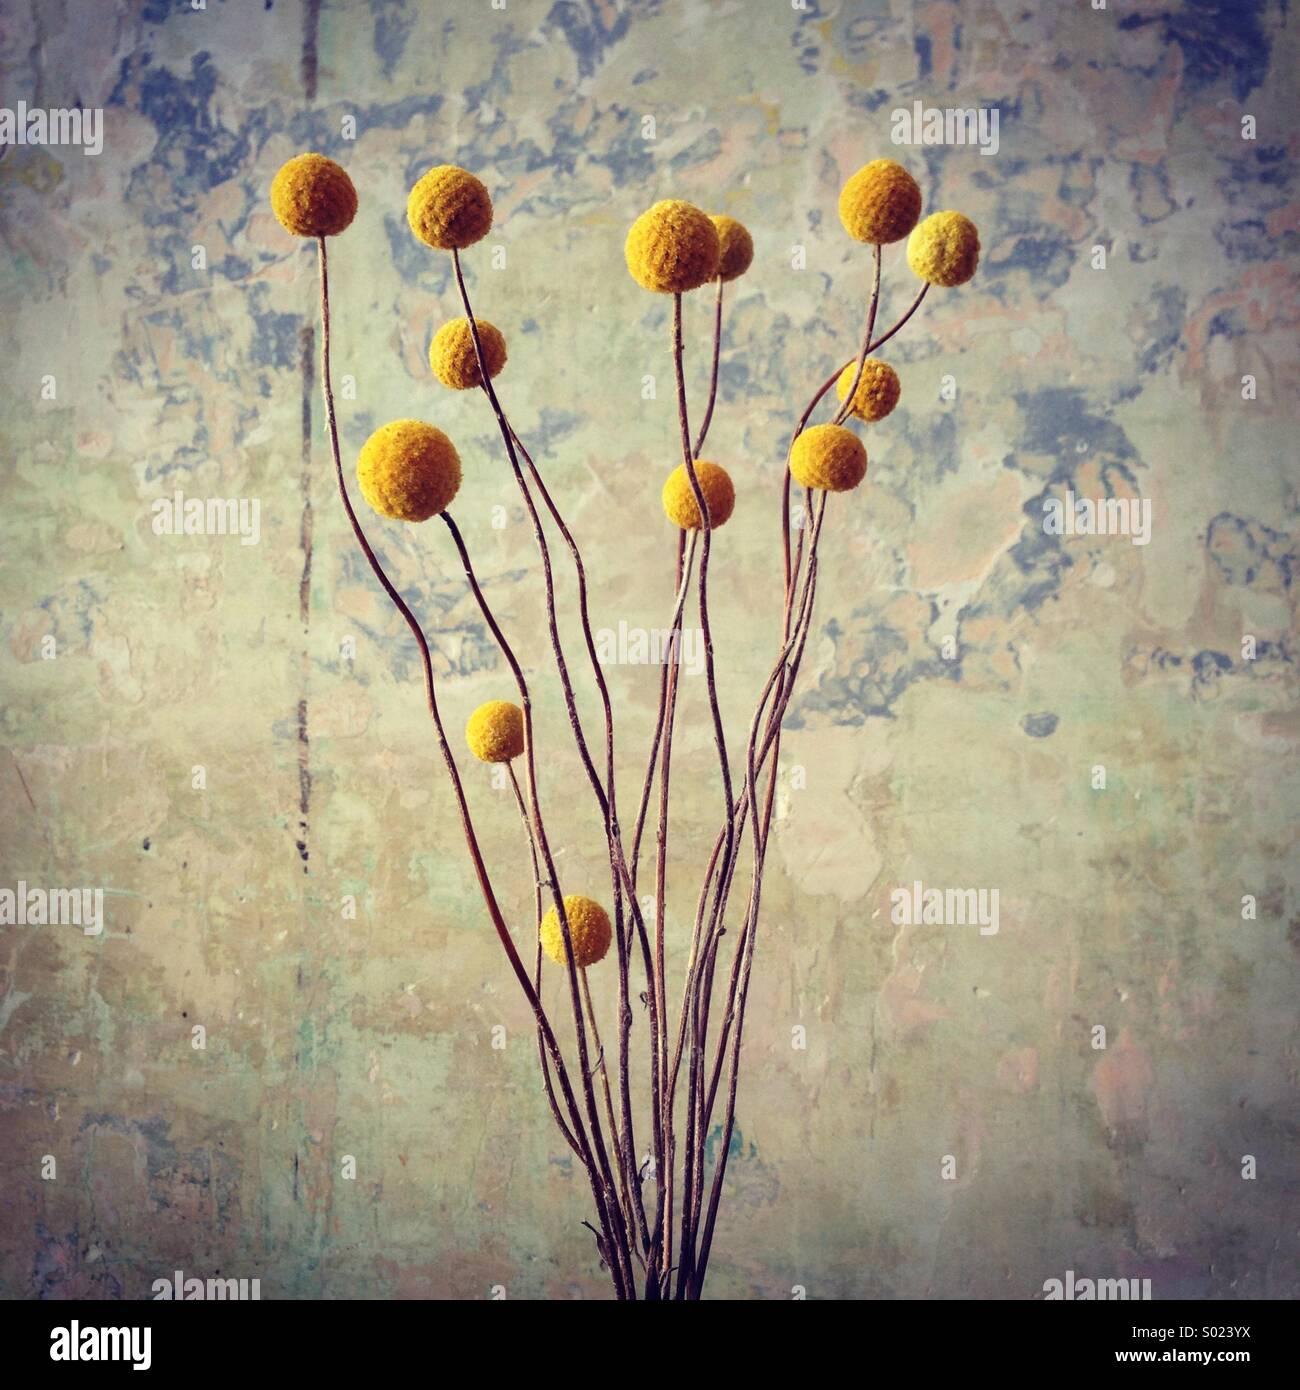 Kultige Blumen Angriff eine notleidende Wand. Perth, Australien Stockbild